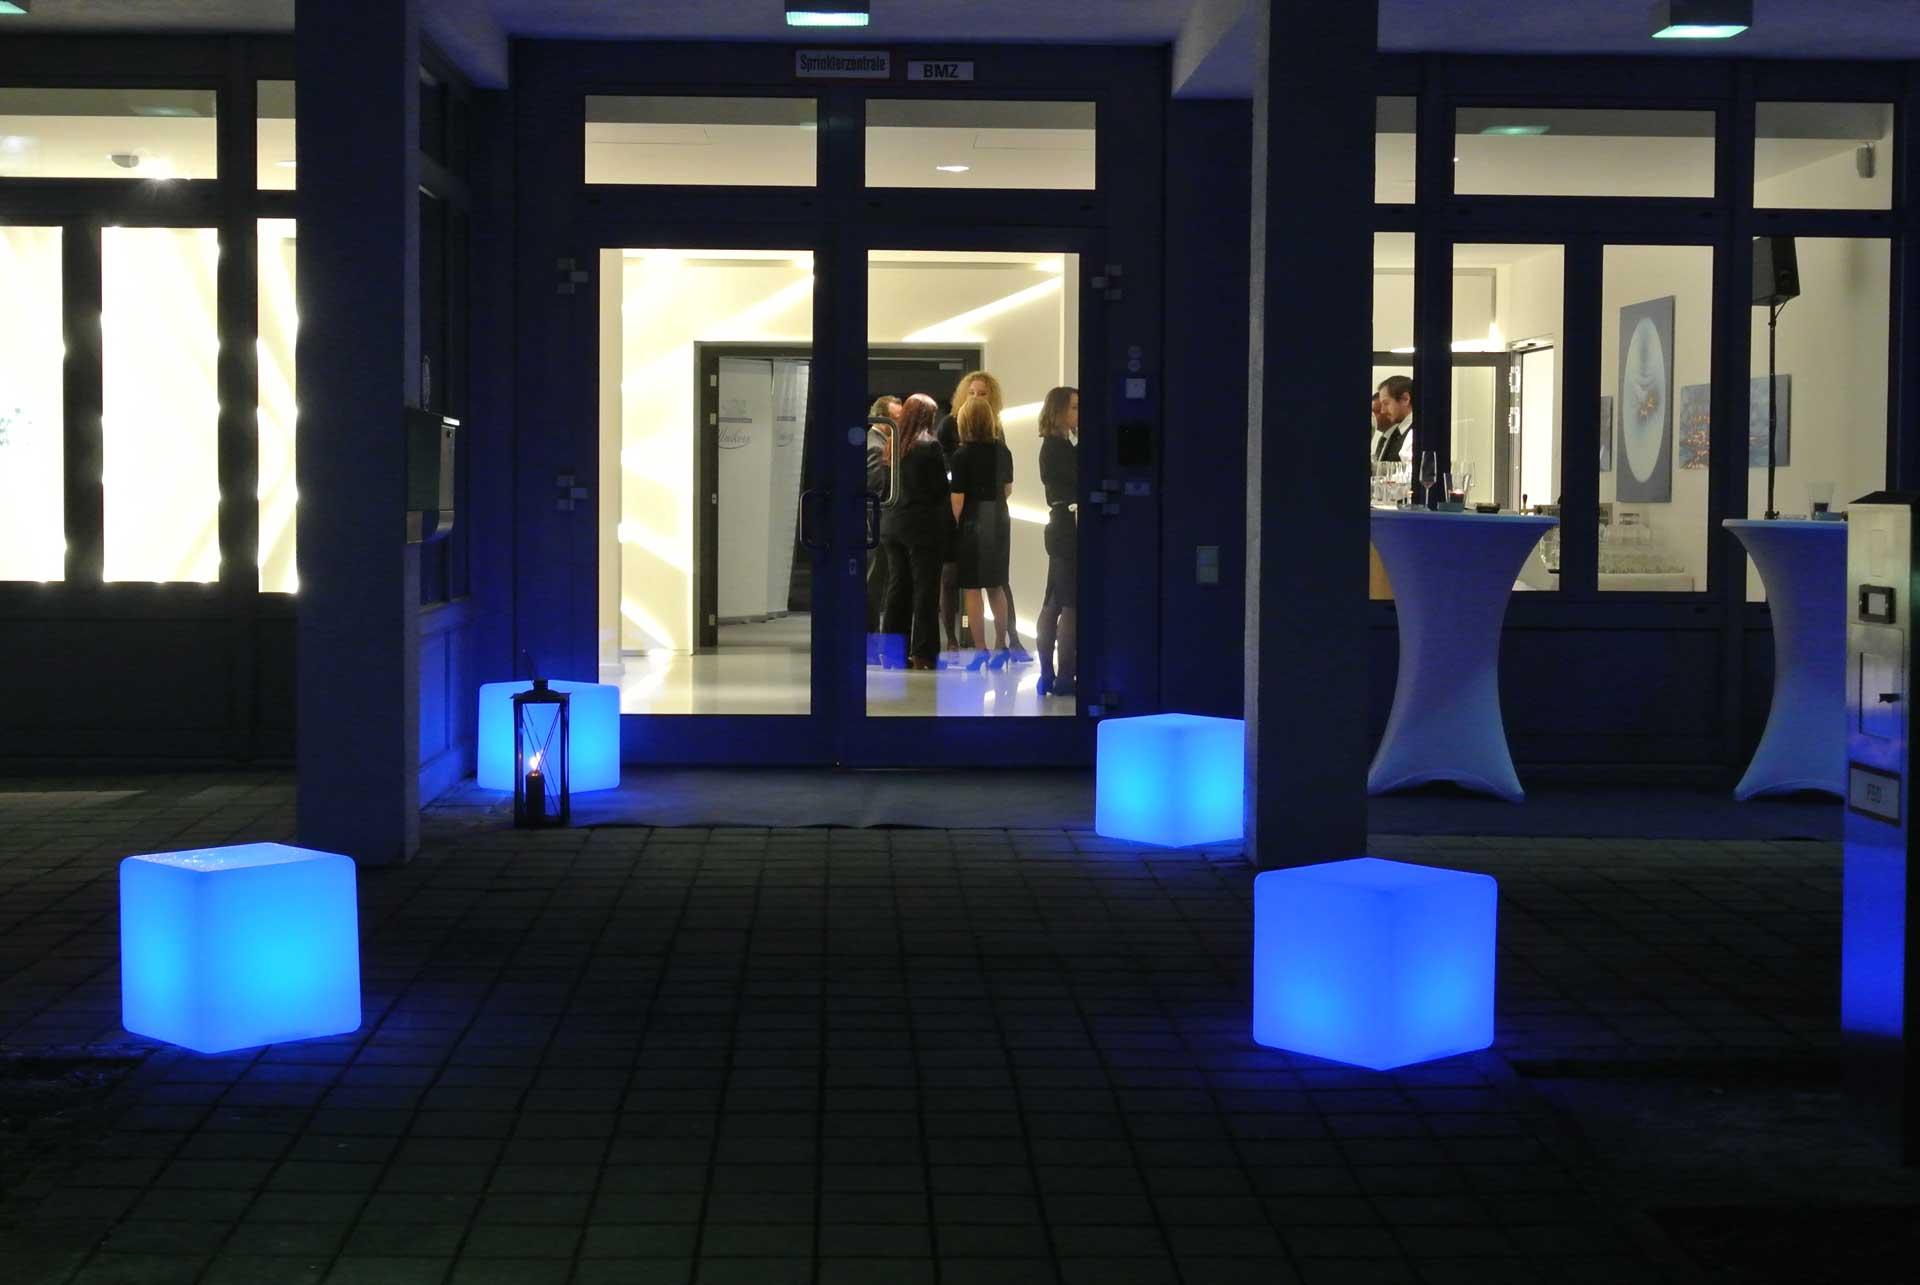 Feier bei DornierMedTech in Weßling